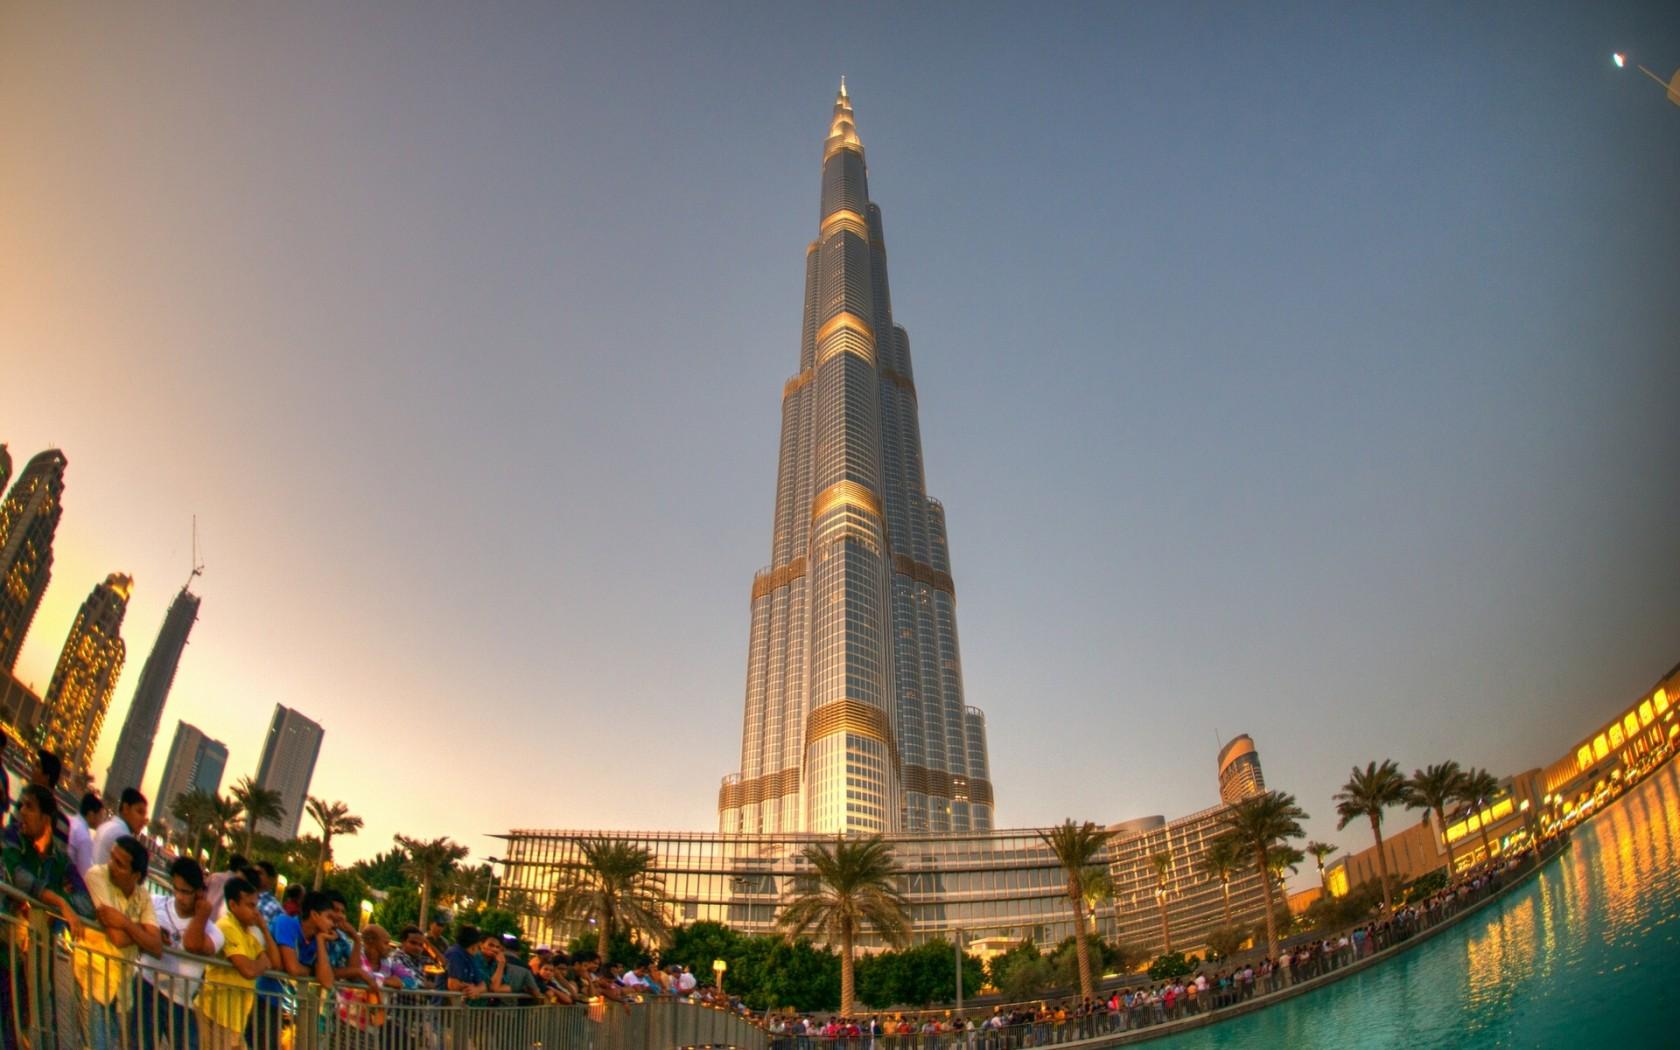 Burj Khalifa View Wallpaper   Travel HD Wallpapers 1680x1050